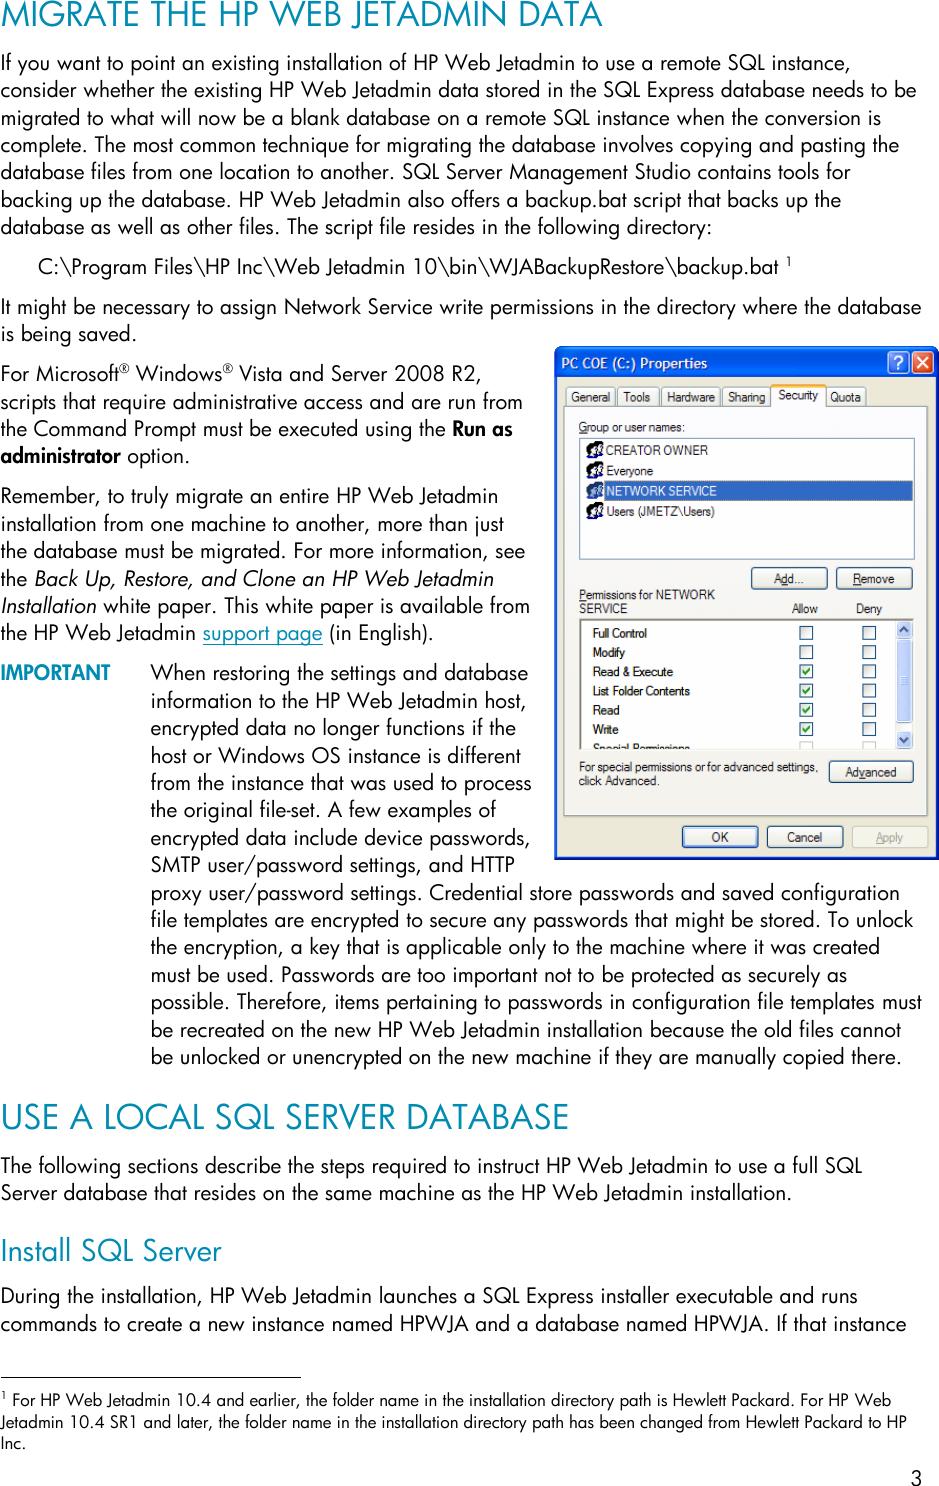 HP Using Microsoft SQL Server With Web Jetadmin ENWW C01763040